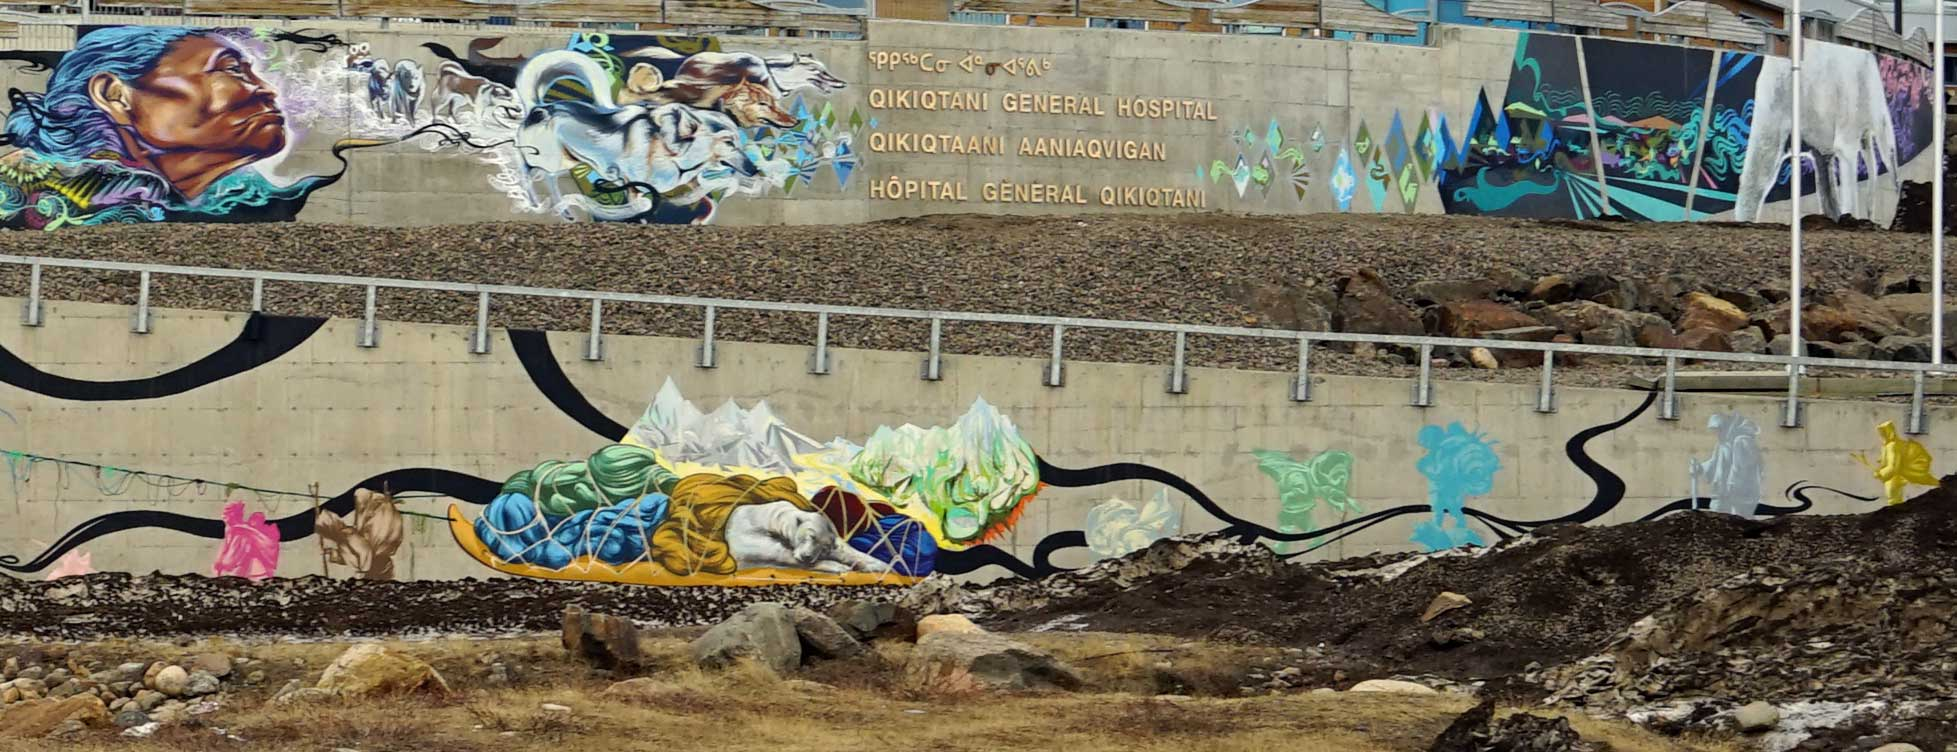 Kamatik (sled). Mural. Qikiqtani General Hospital. Photo: Christine Montague